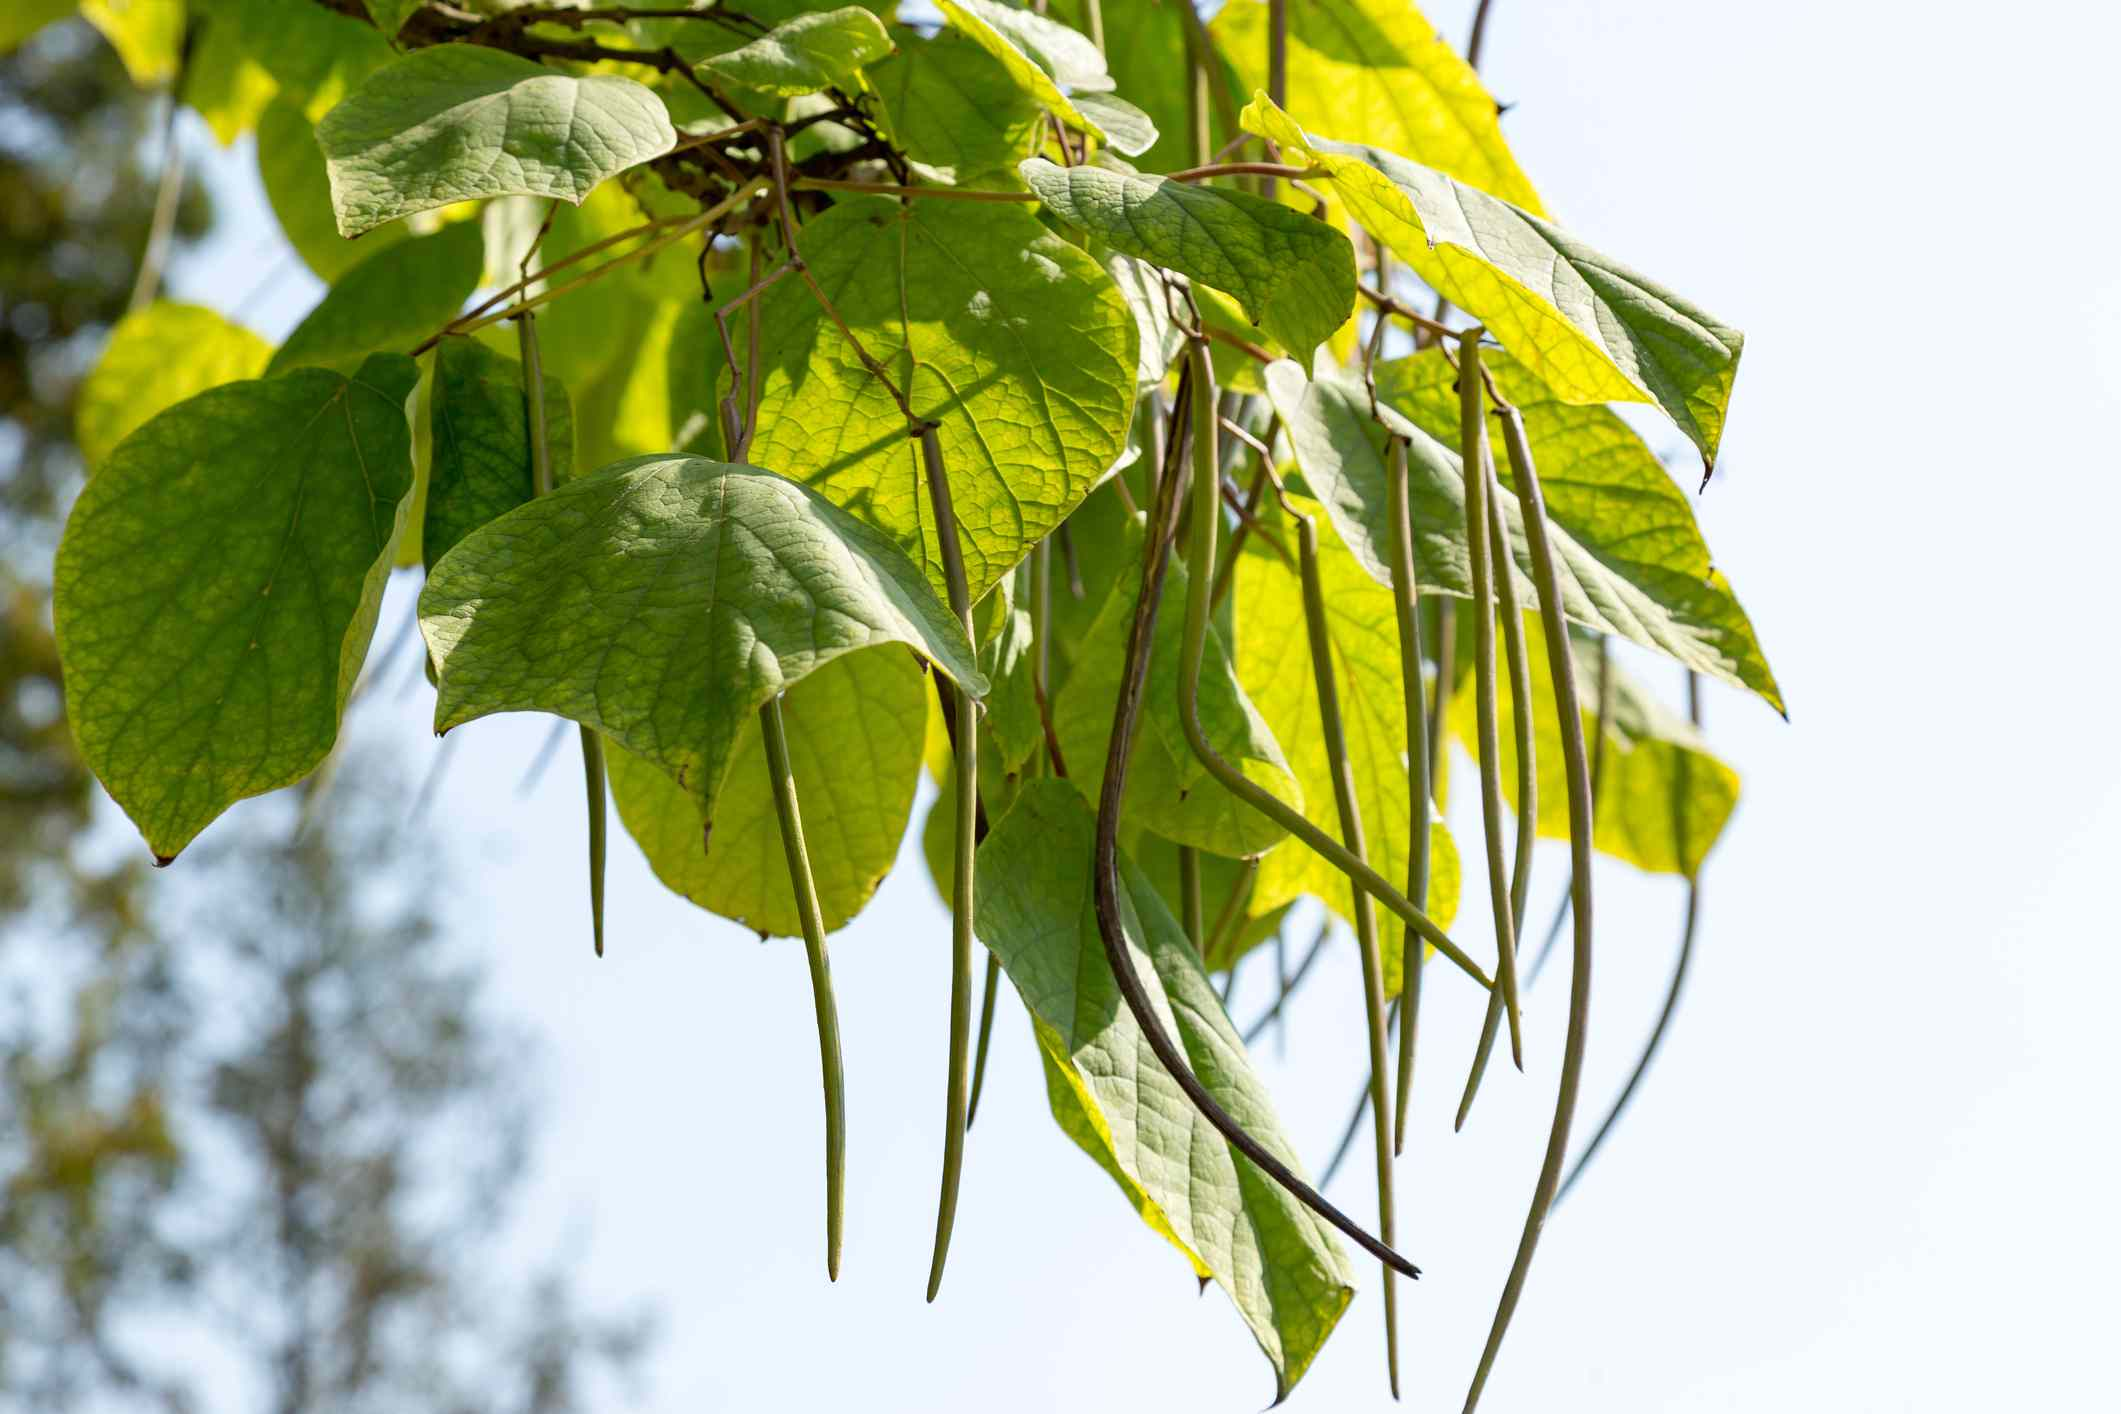 Northern catalpa tree bean pods